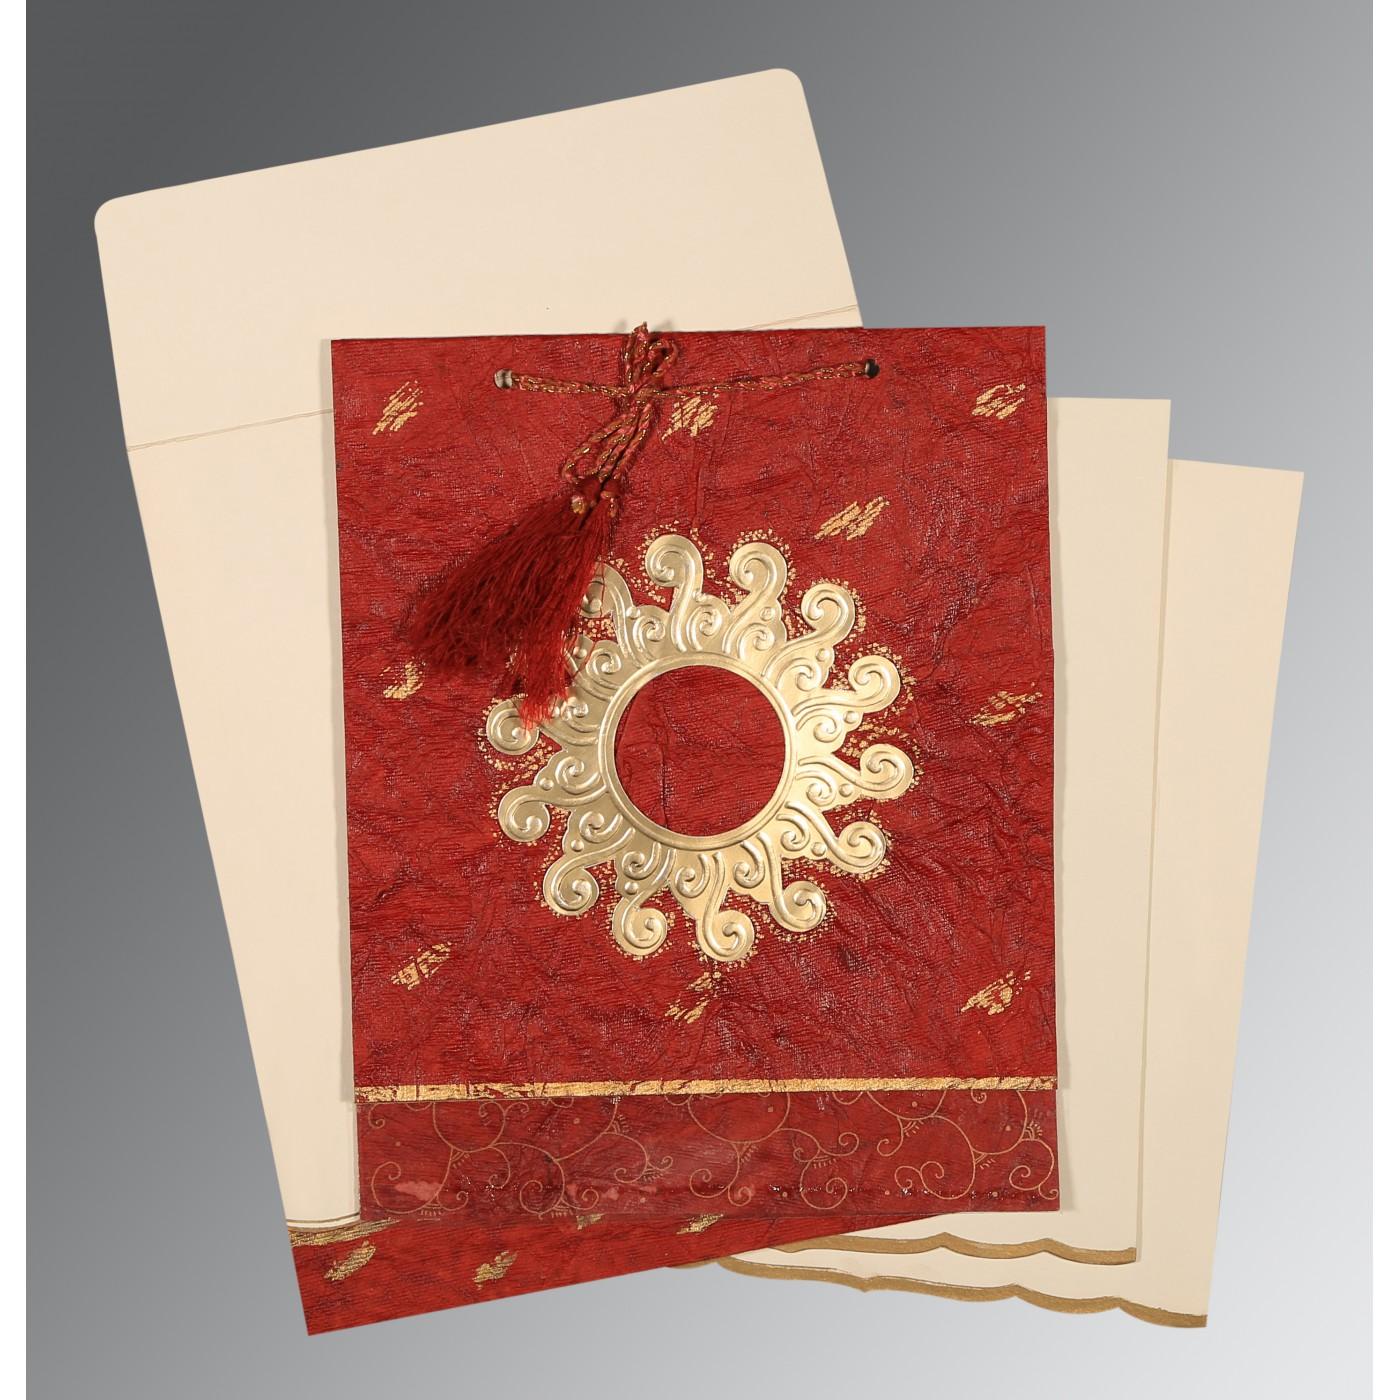 MAROON GOLD SHIMMERY EMBOSSED WEDDING INVITATION : D-1264 - 123WeddingCards